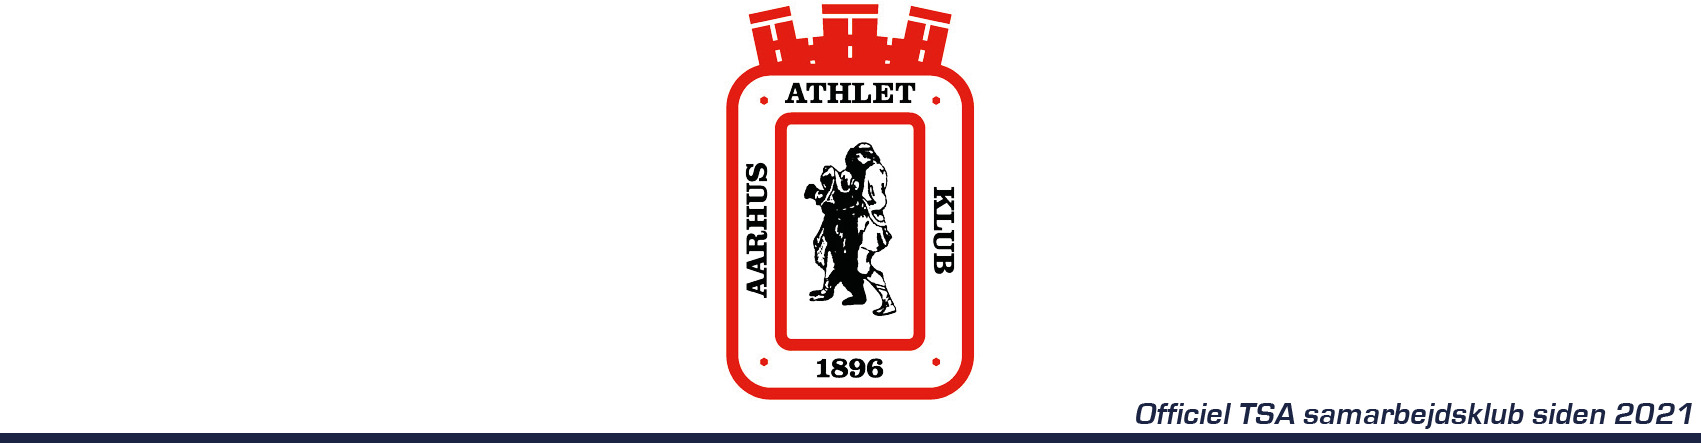 Aarhus_athlet_klub_1896-01